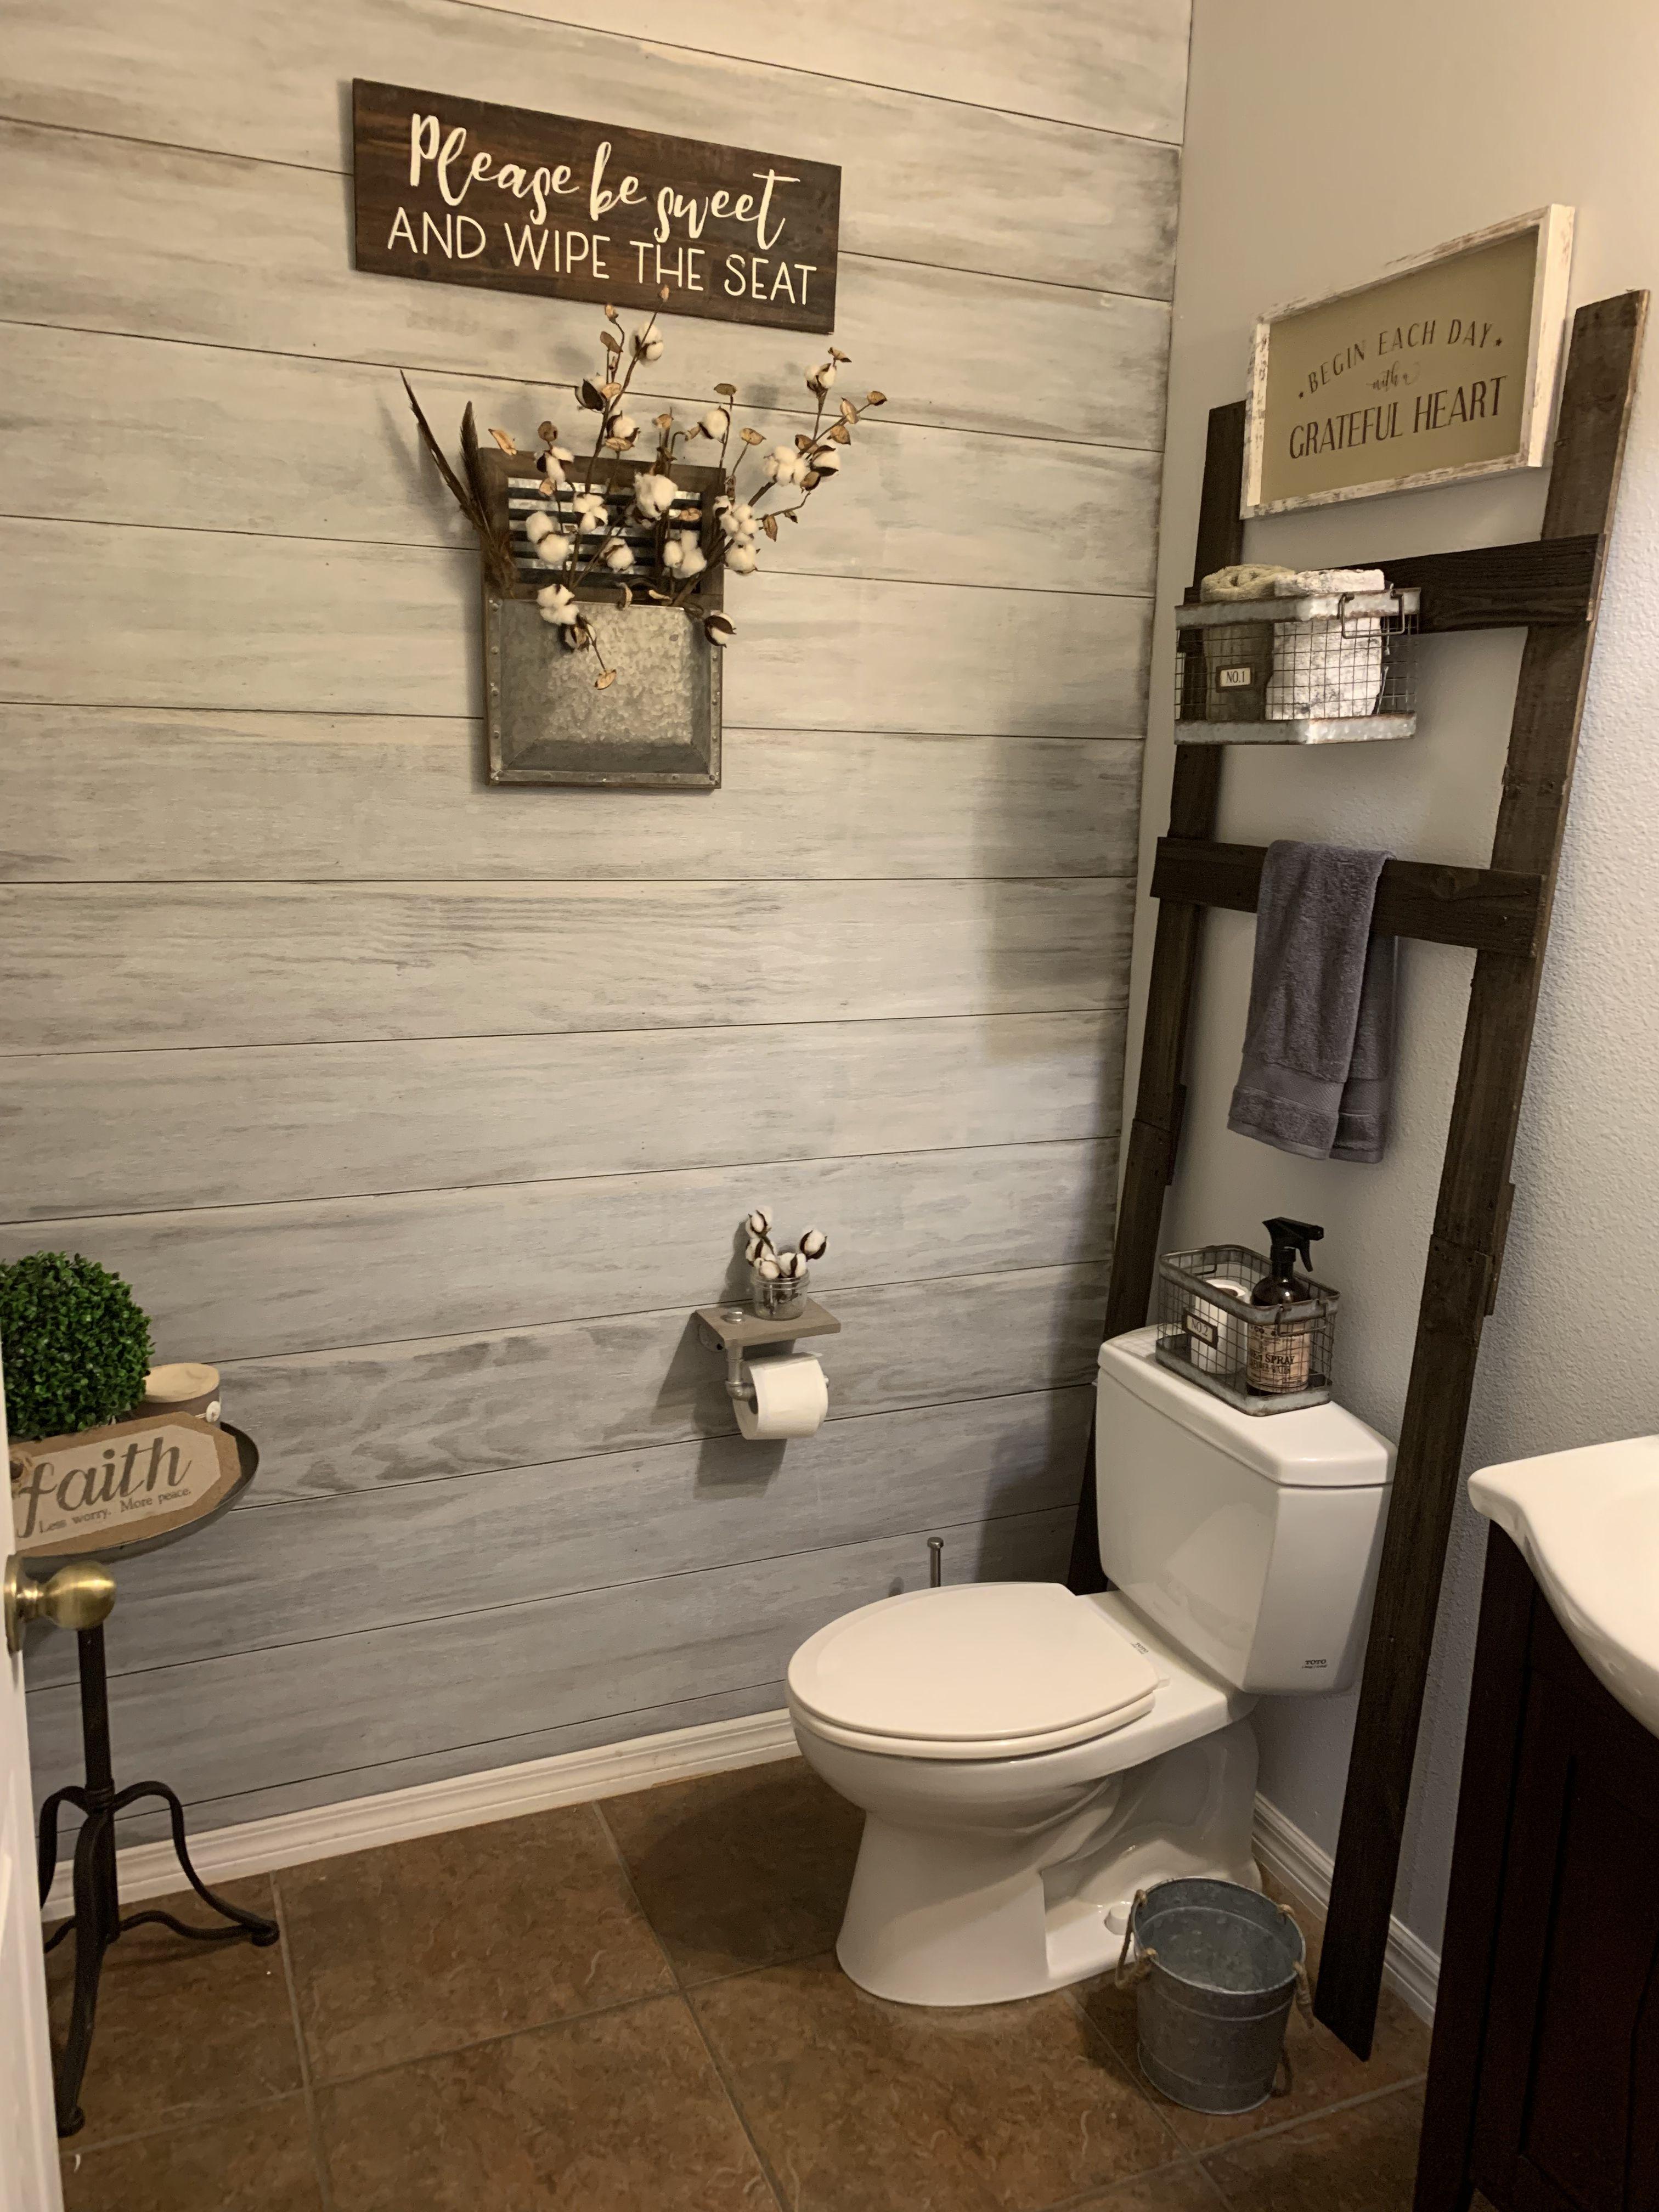 Pin On Shiplap Walls Half bathroom design ideas